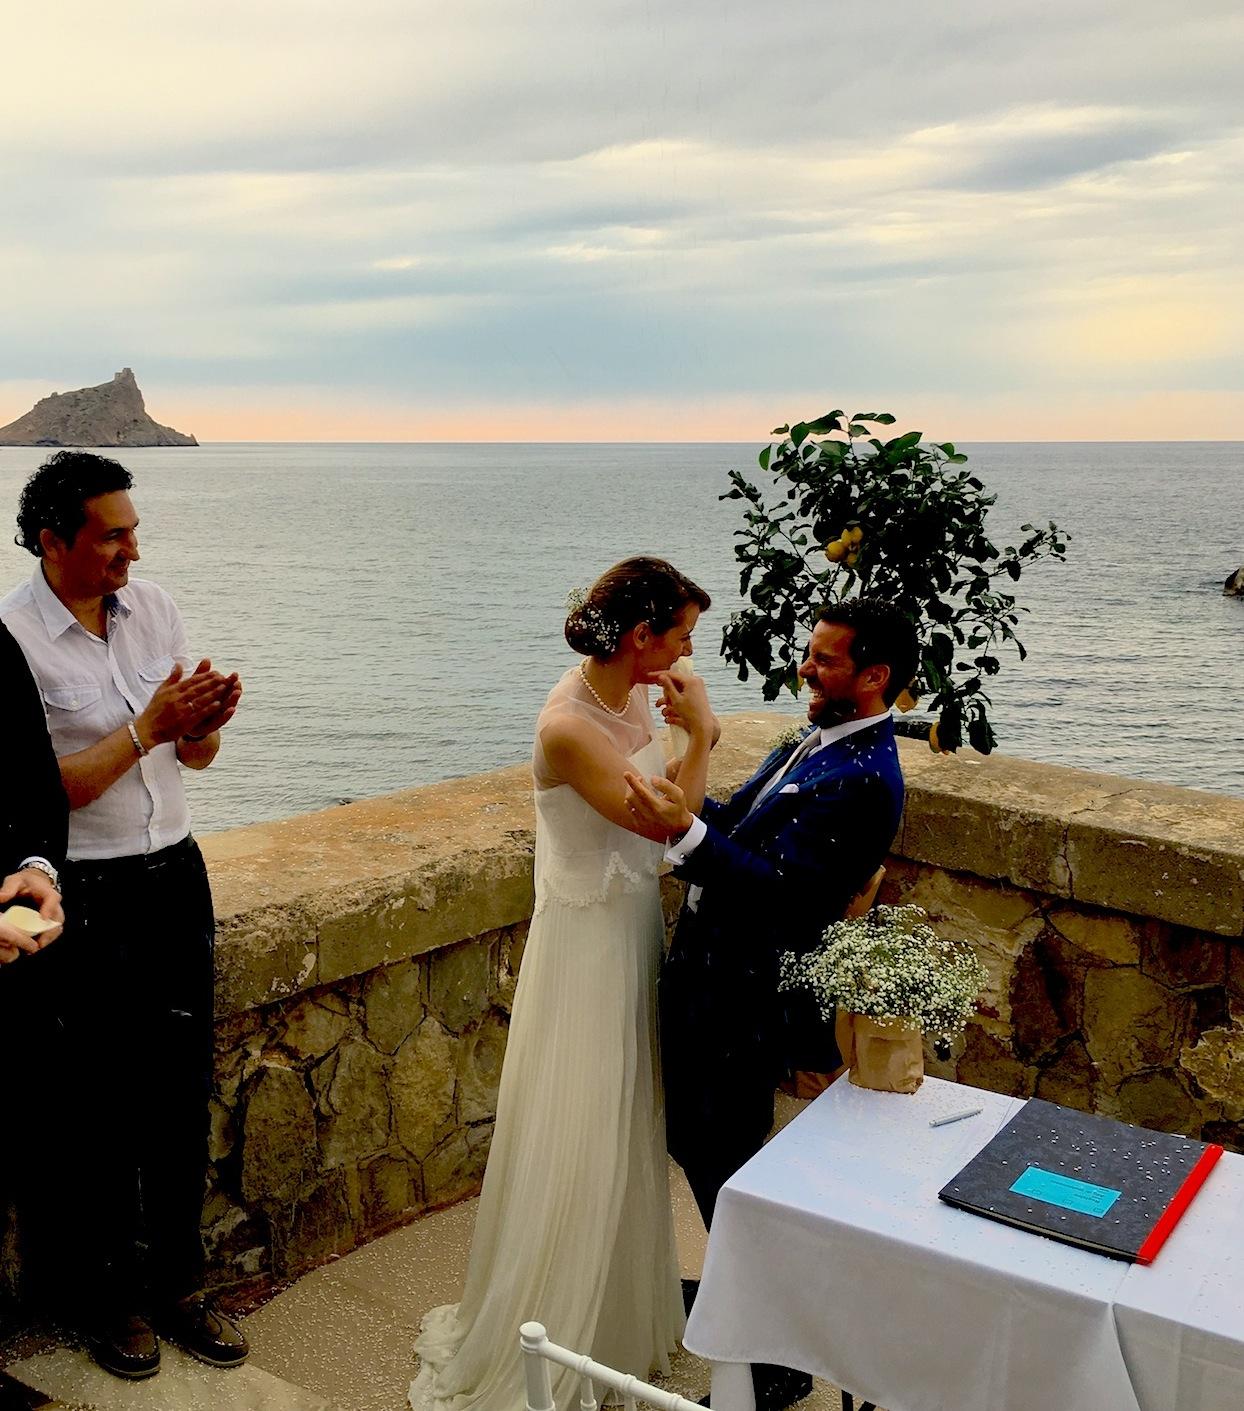 Matrimonio In Sicilia : Matrimonio in sicilia giugno